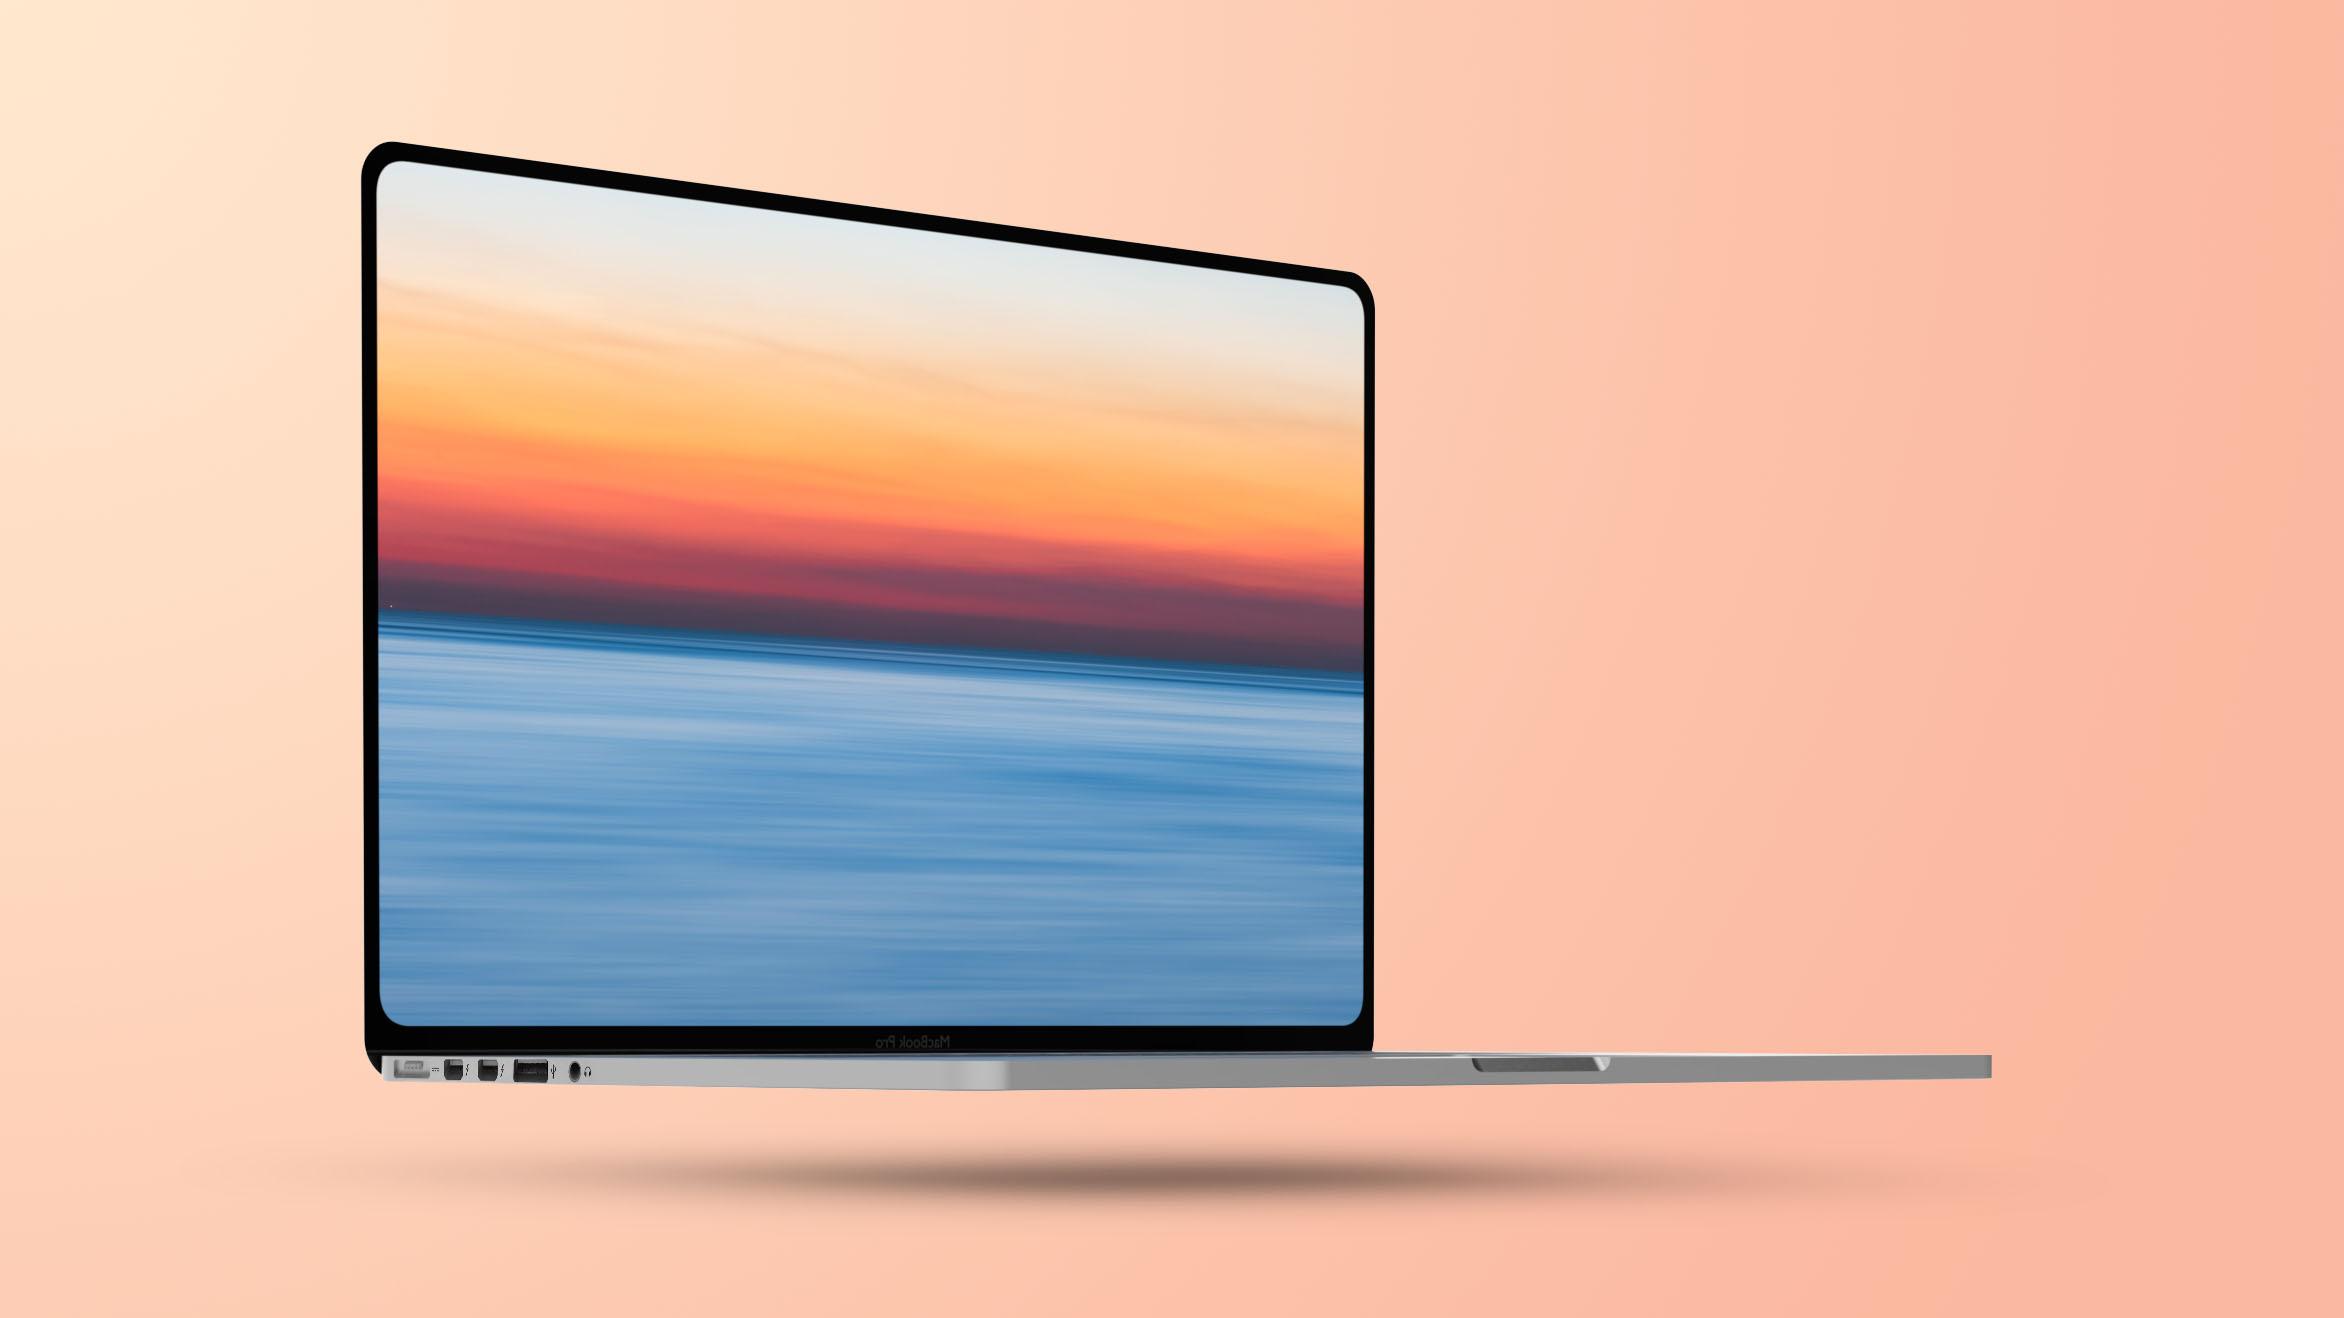 Flat 2021 MacBook Pro Mockup Feature